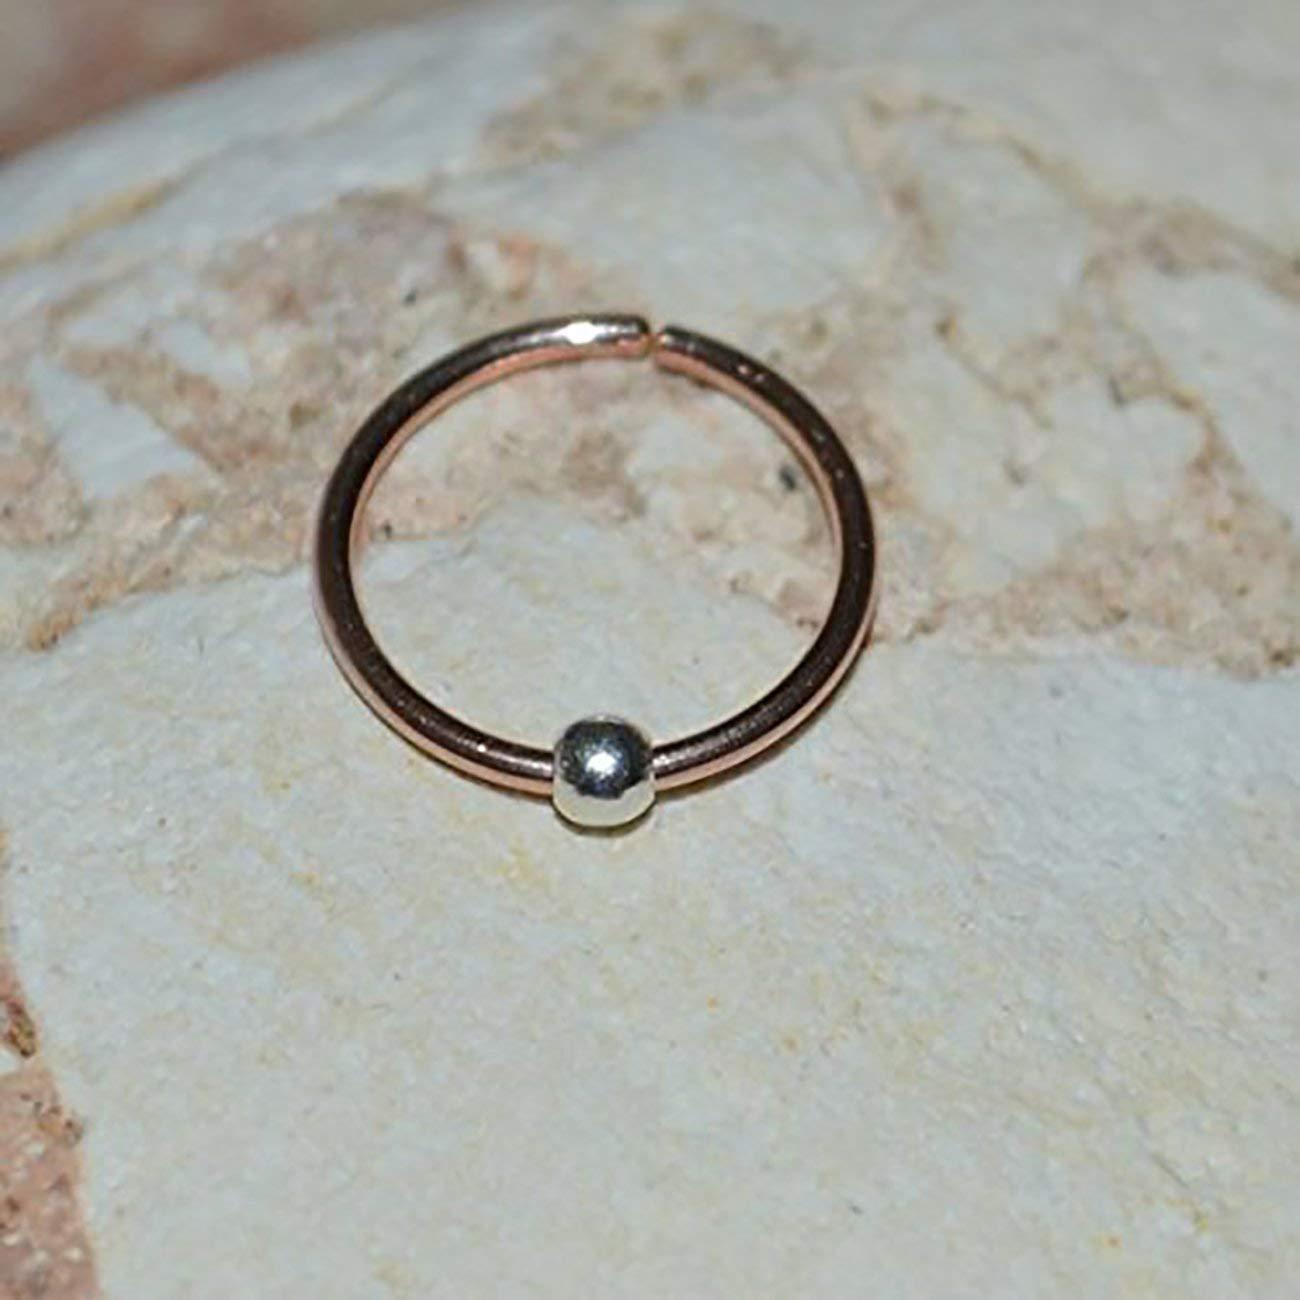 49114088e TRAGUS JEWELRY // Gold Tragus Earring - Nose Hoop - Forward Helix Earring -  Daith Earring - Cartilage Earring 20g - Rook Piercing 20 gauge: Amazon.ca:  ...